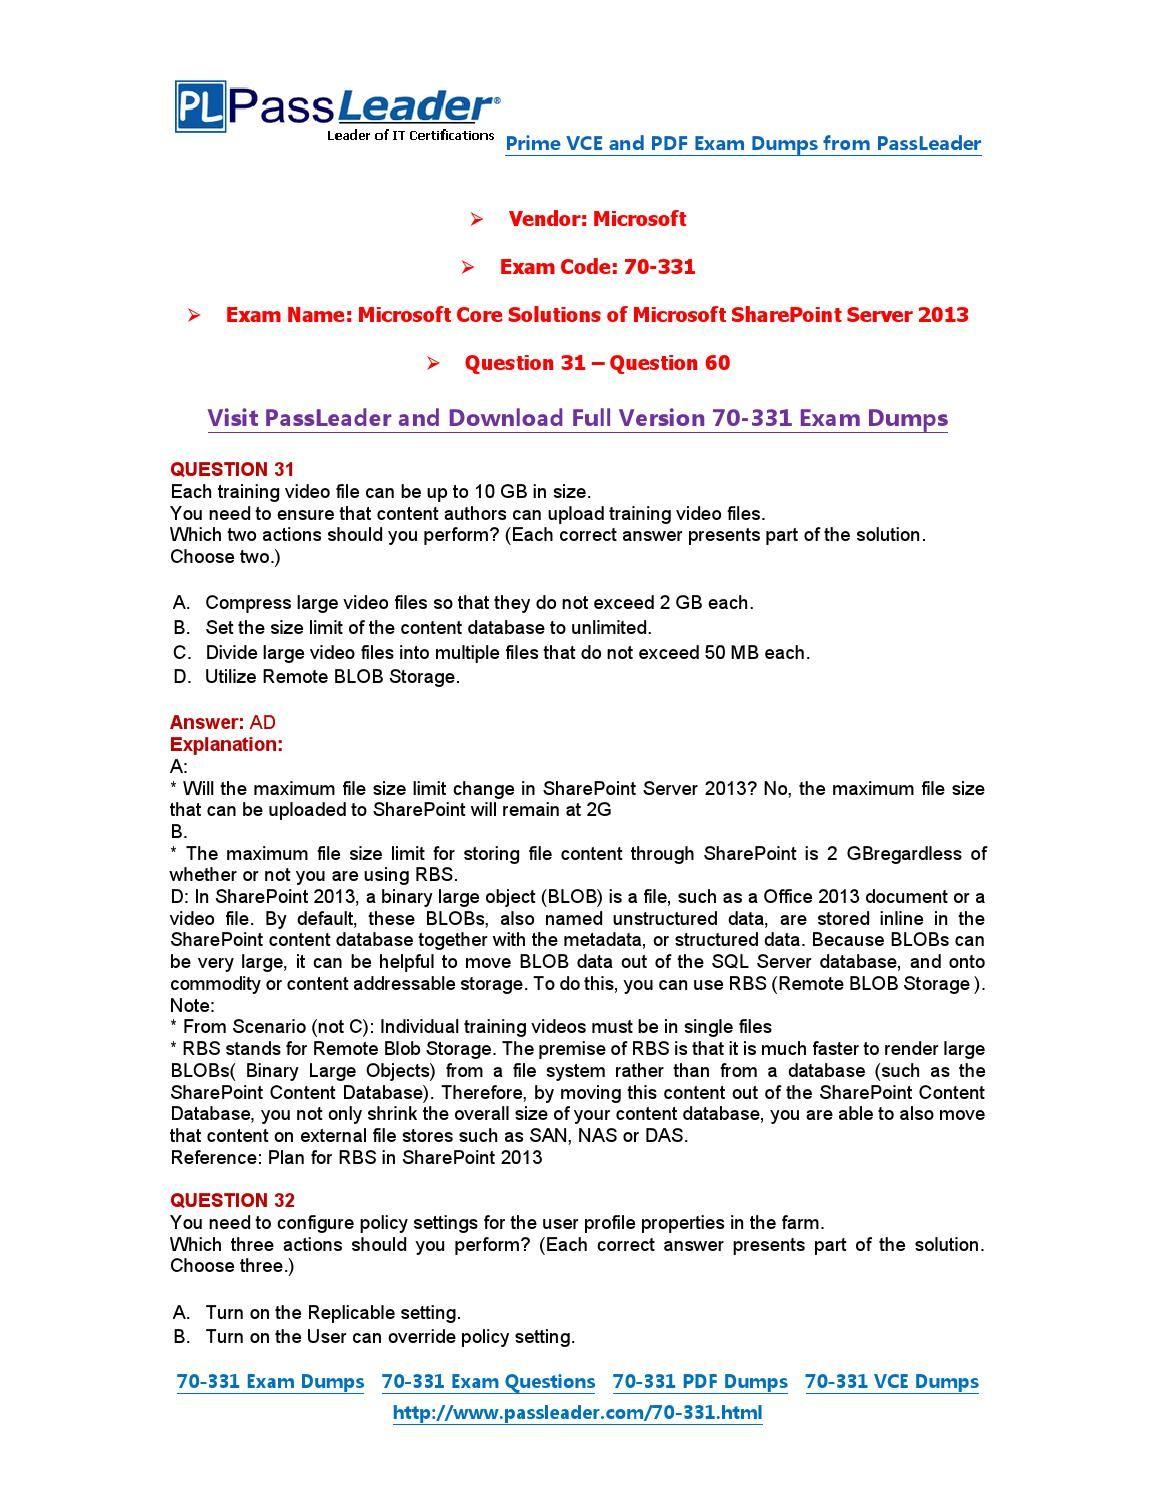 70 331 exam dumps with pdf and vce download 31 60 70 331 exam 70 331 exam dumps with pdf and vce download 31 60 xflitez Choice Image